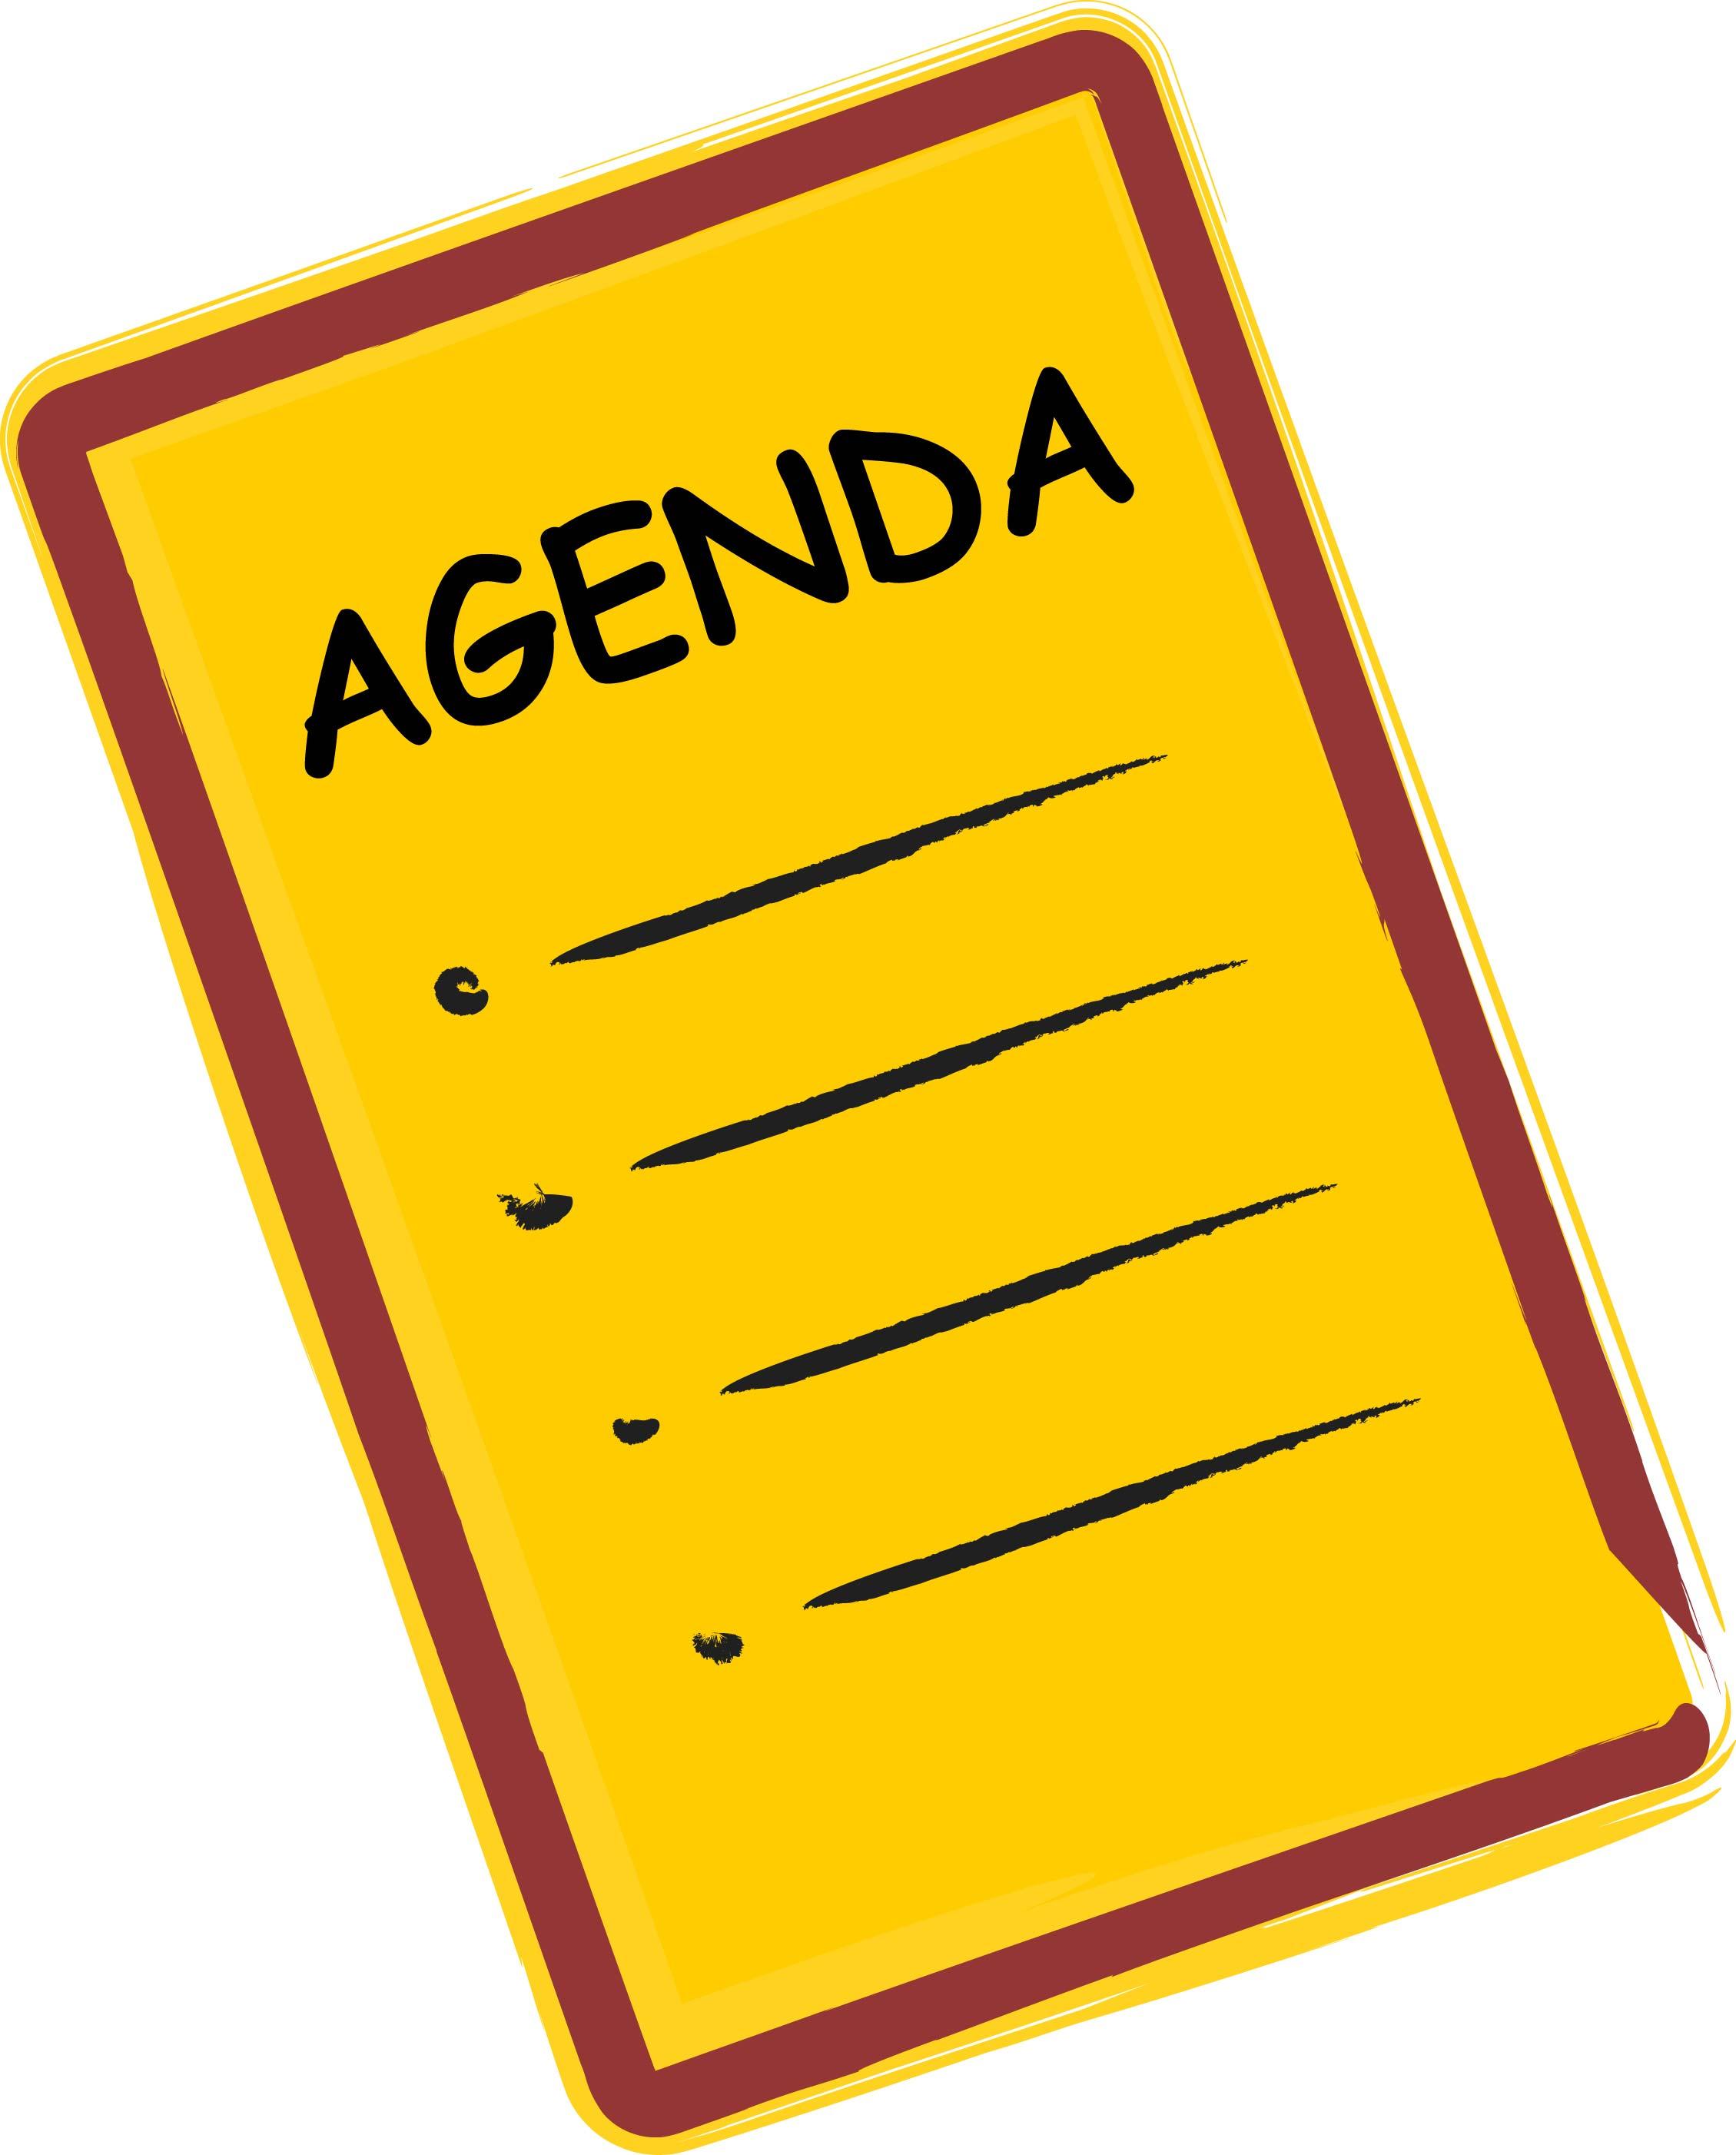 animasi-bergerak-agenda-rencana-0011